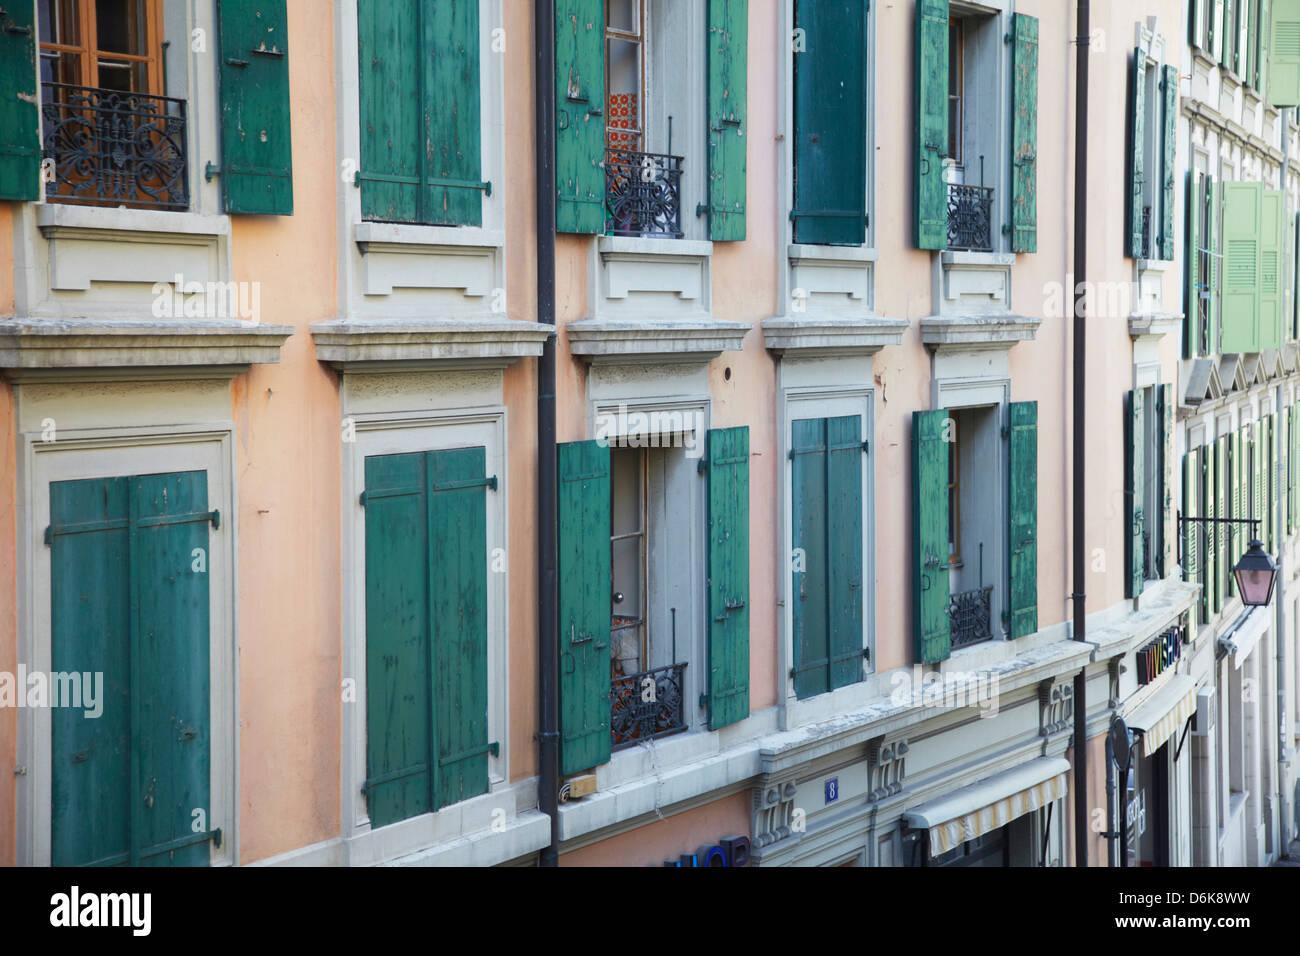 Typical architecture, Lausanne, Vaud, Switzerland, Europe - Stock Image